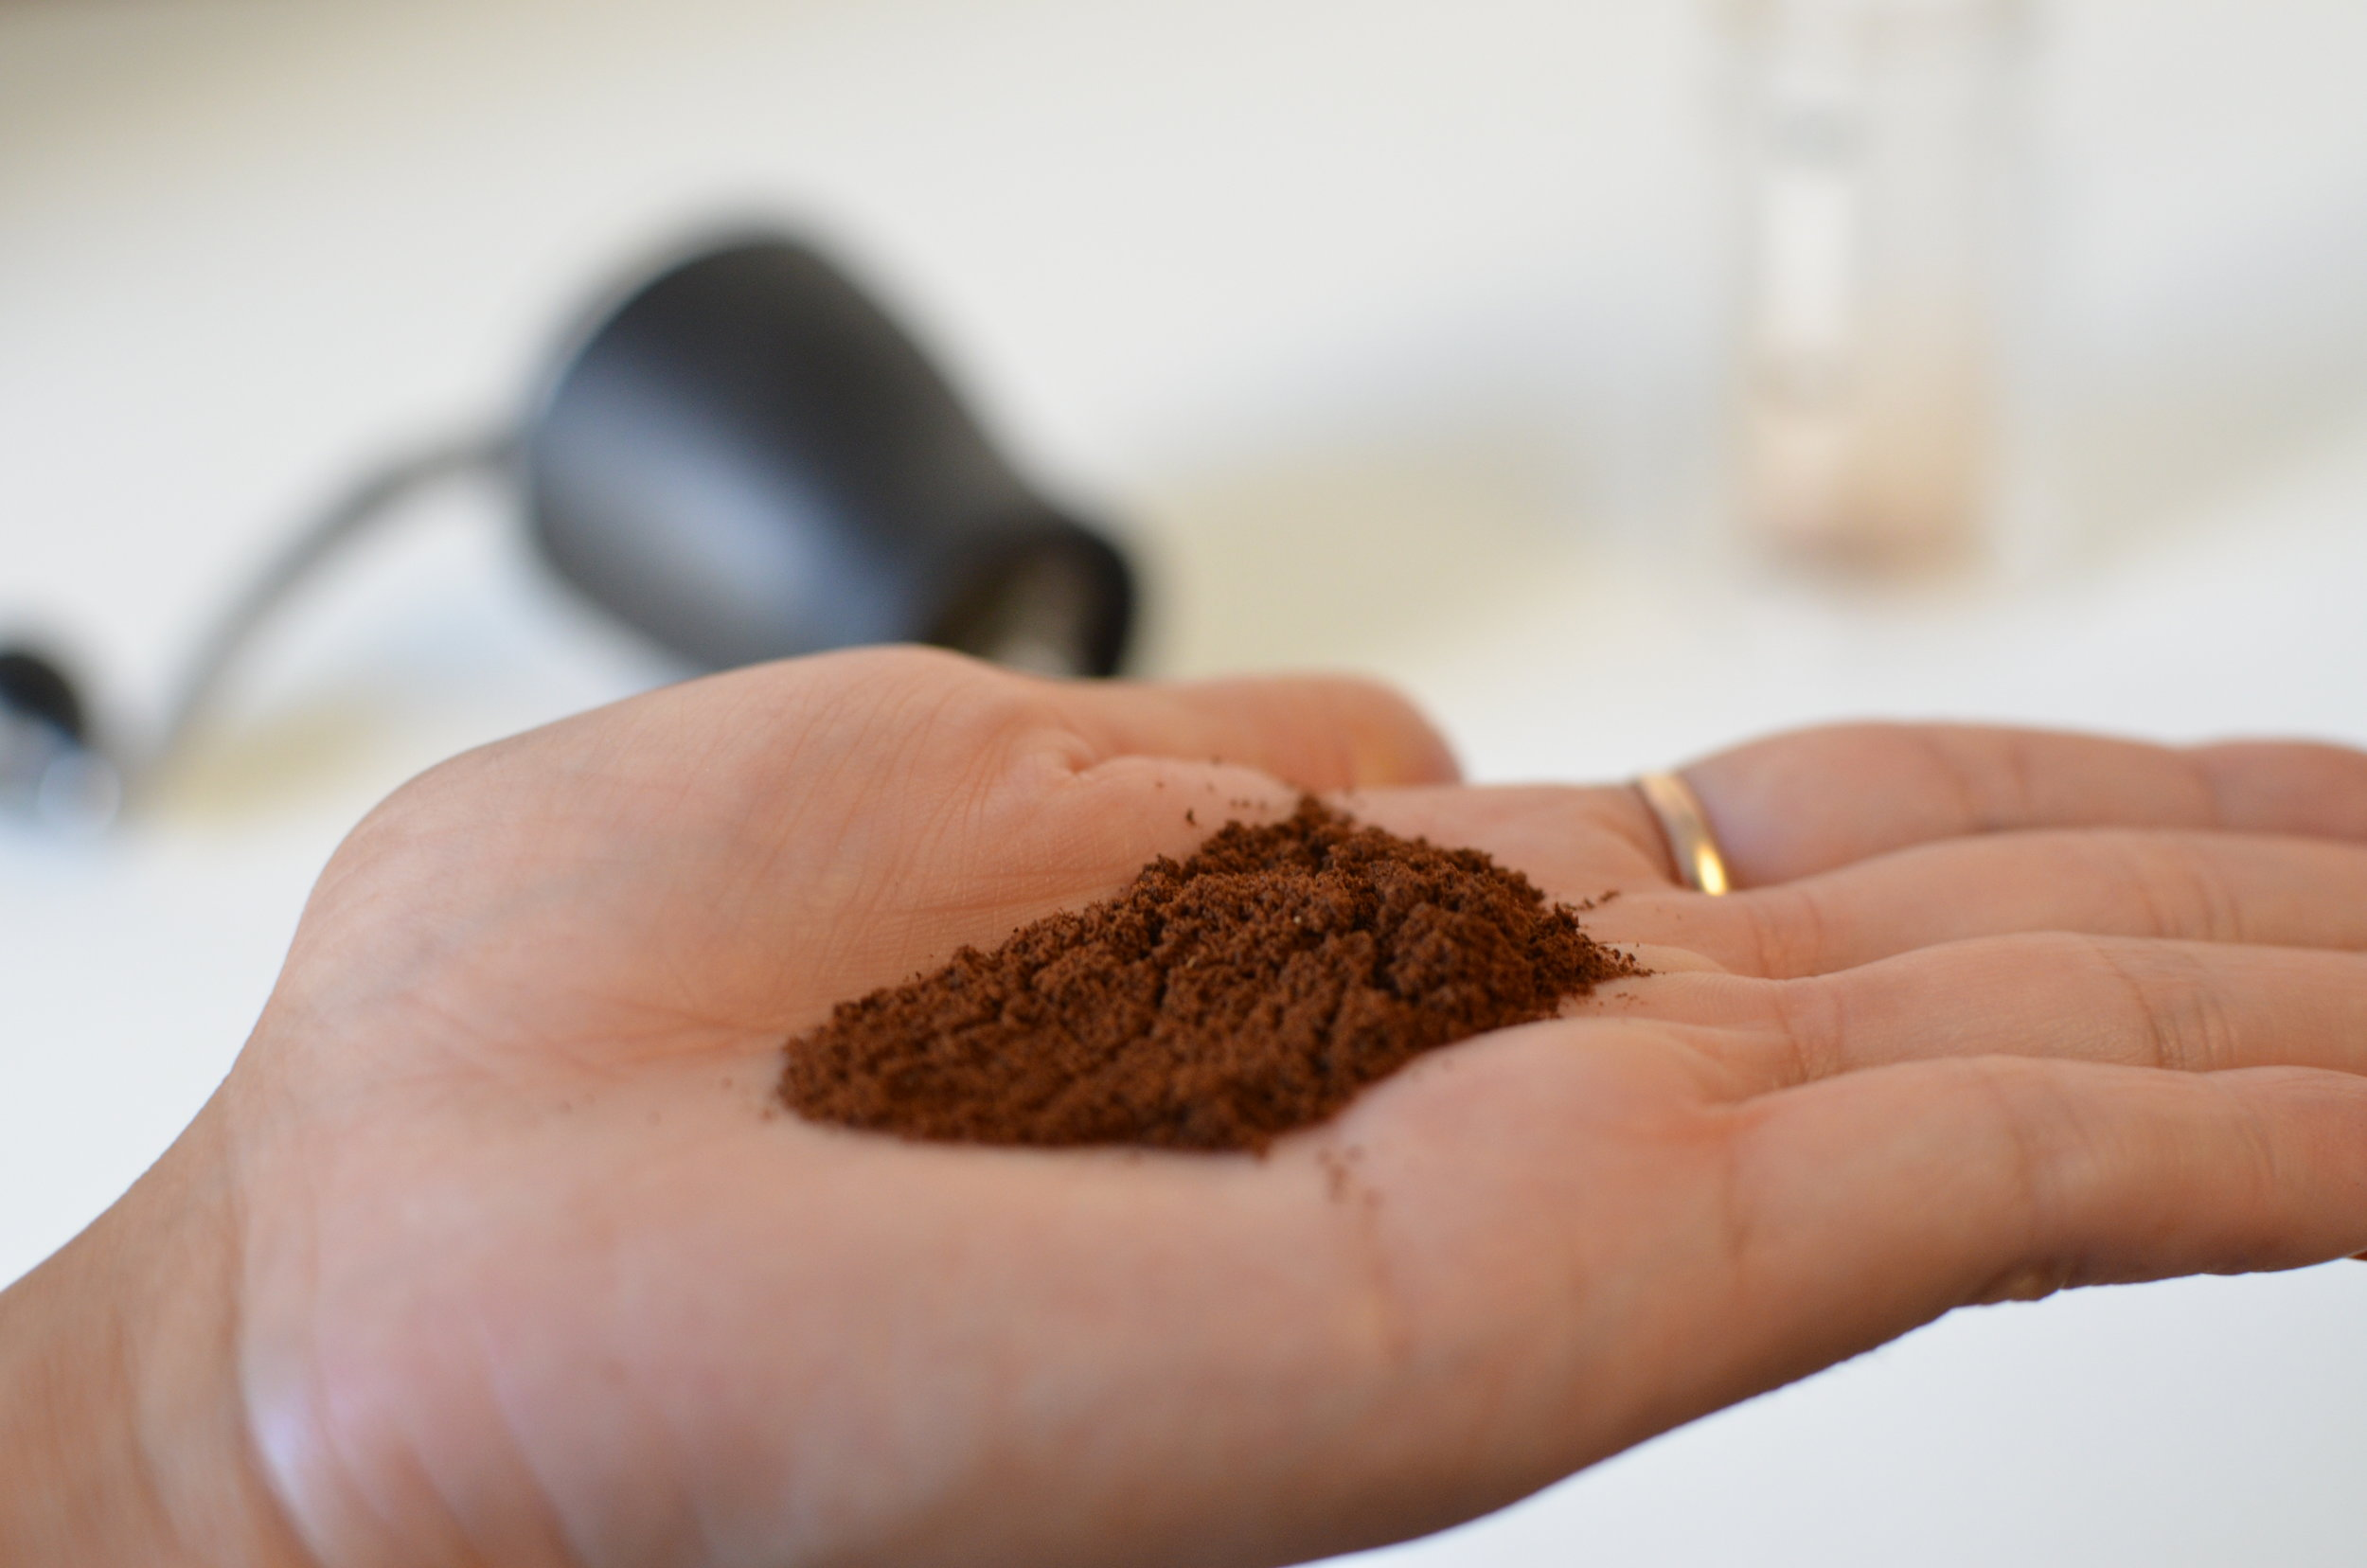 Fine = espresso coffee grind